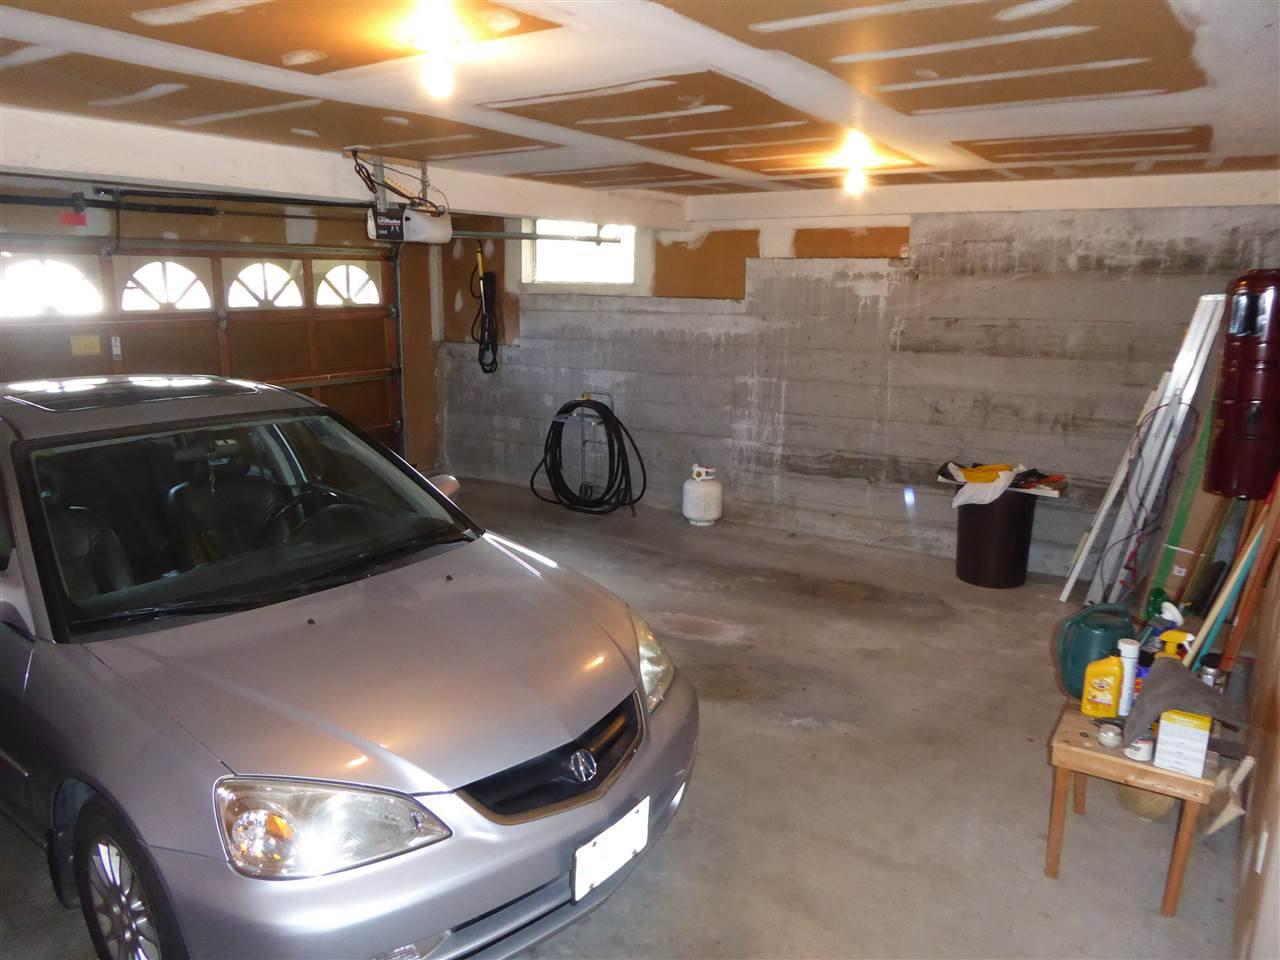 Photo 16: Photos: 1252 DEWAR Way in Port Coquitlam: Citadel PQ House for sale : MLS®# R2199639